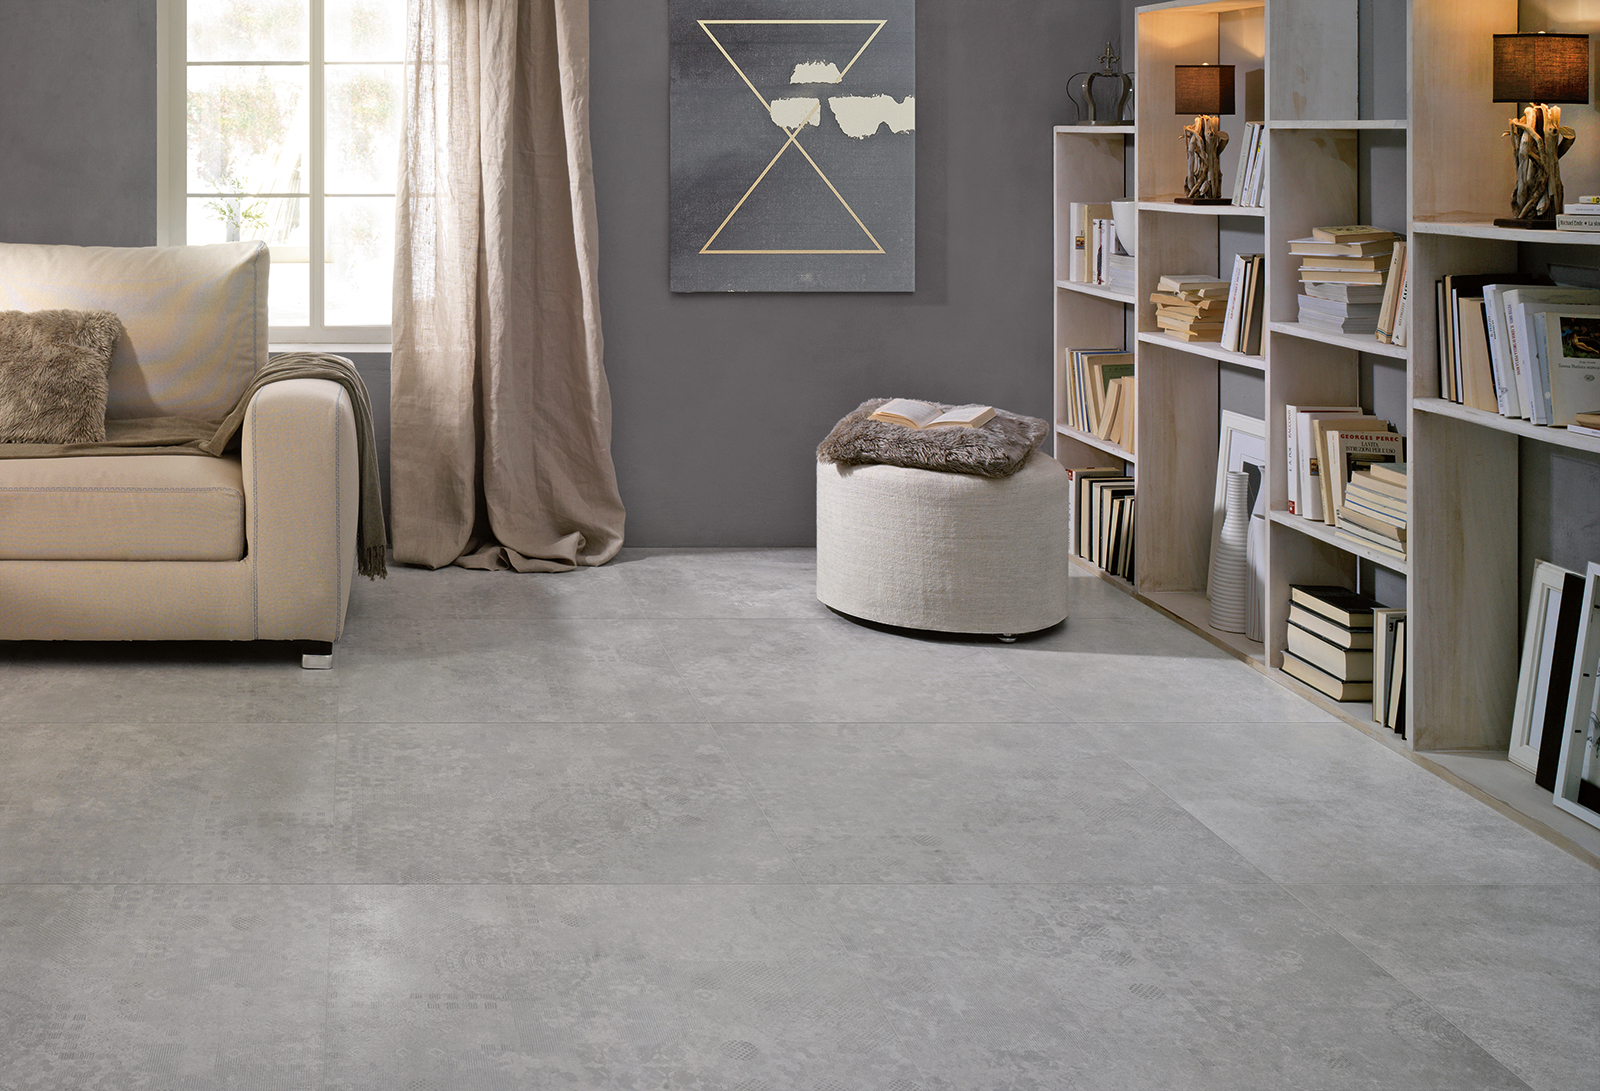 Rivestimento e pavimento serie detroit pavimenti e rivestimenti